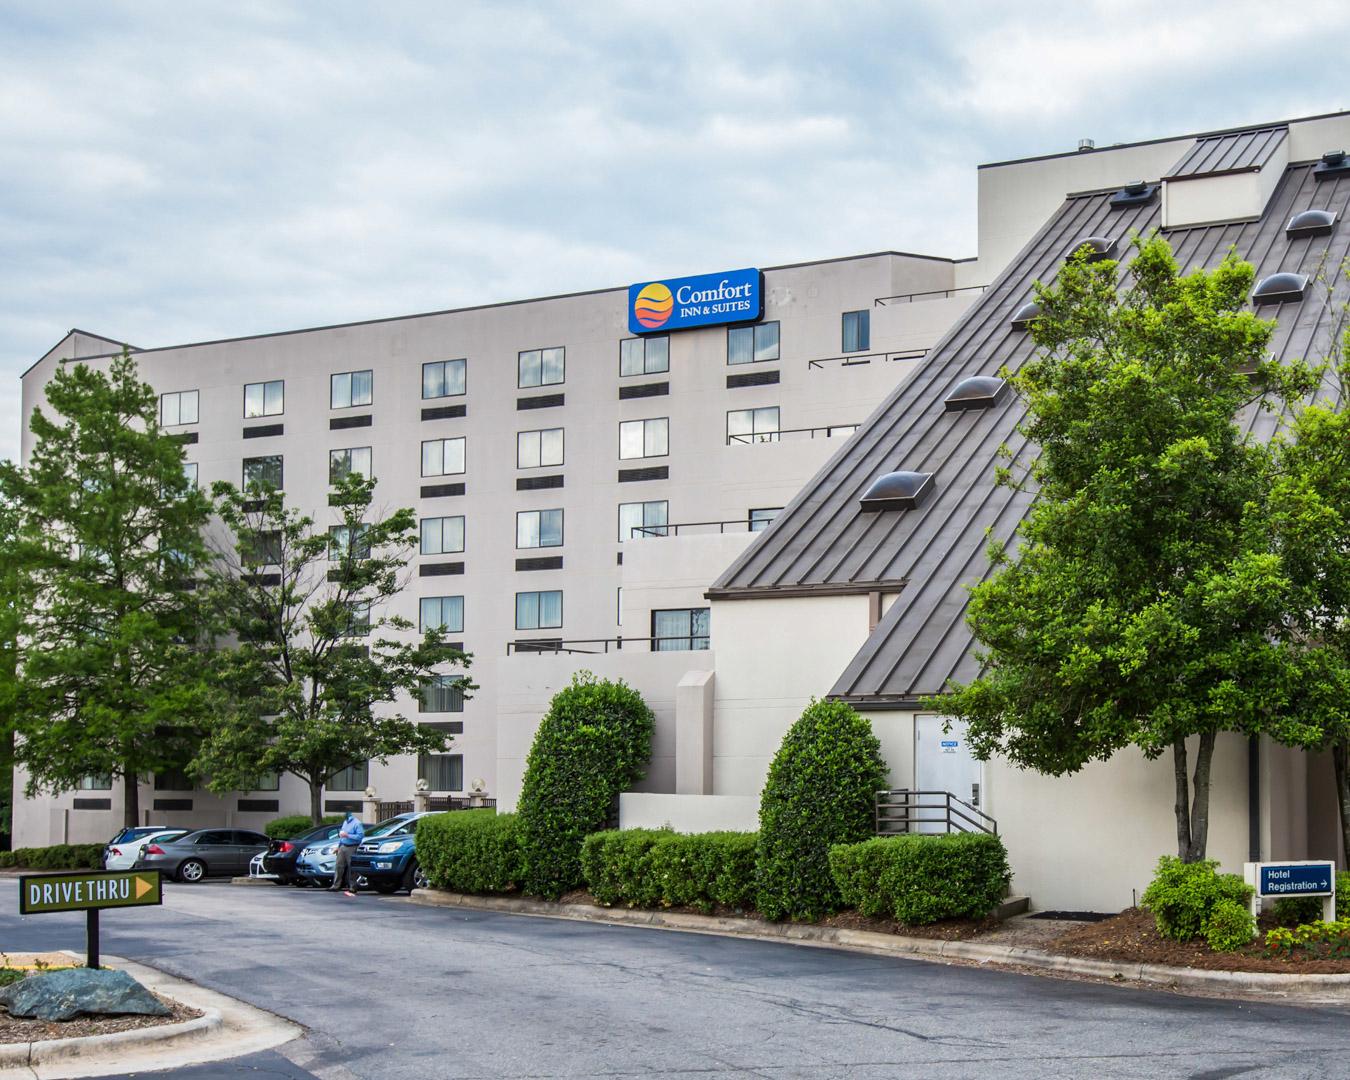 Comfort Inn Amp Suites Crabtree Valley In Raleigh Nc